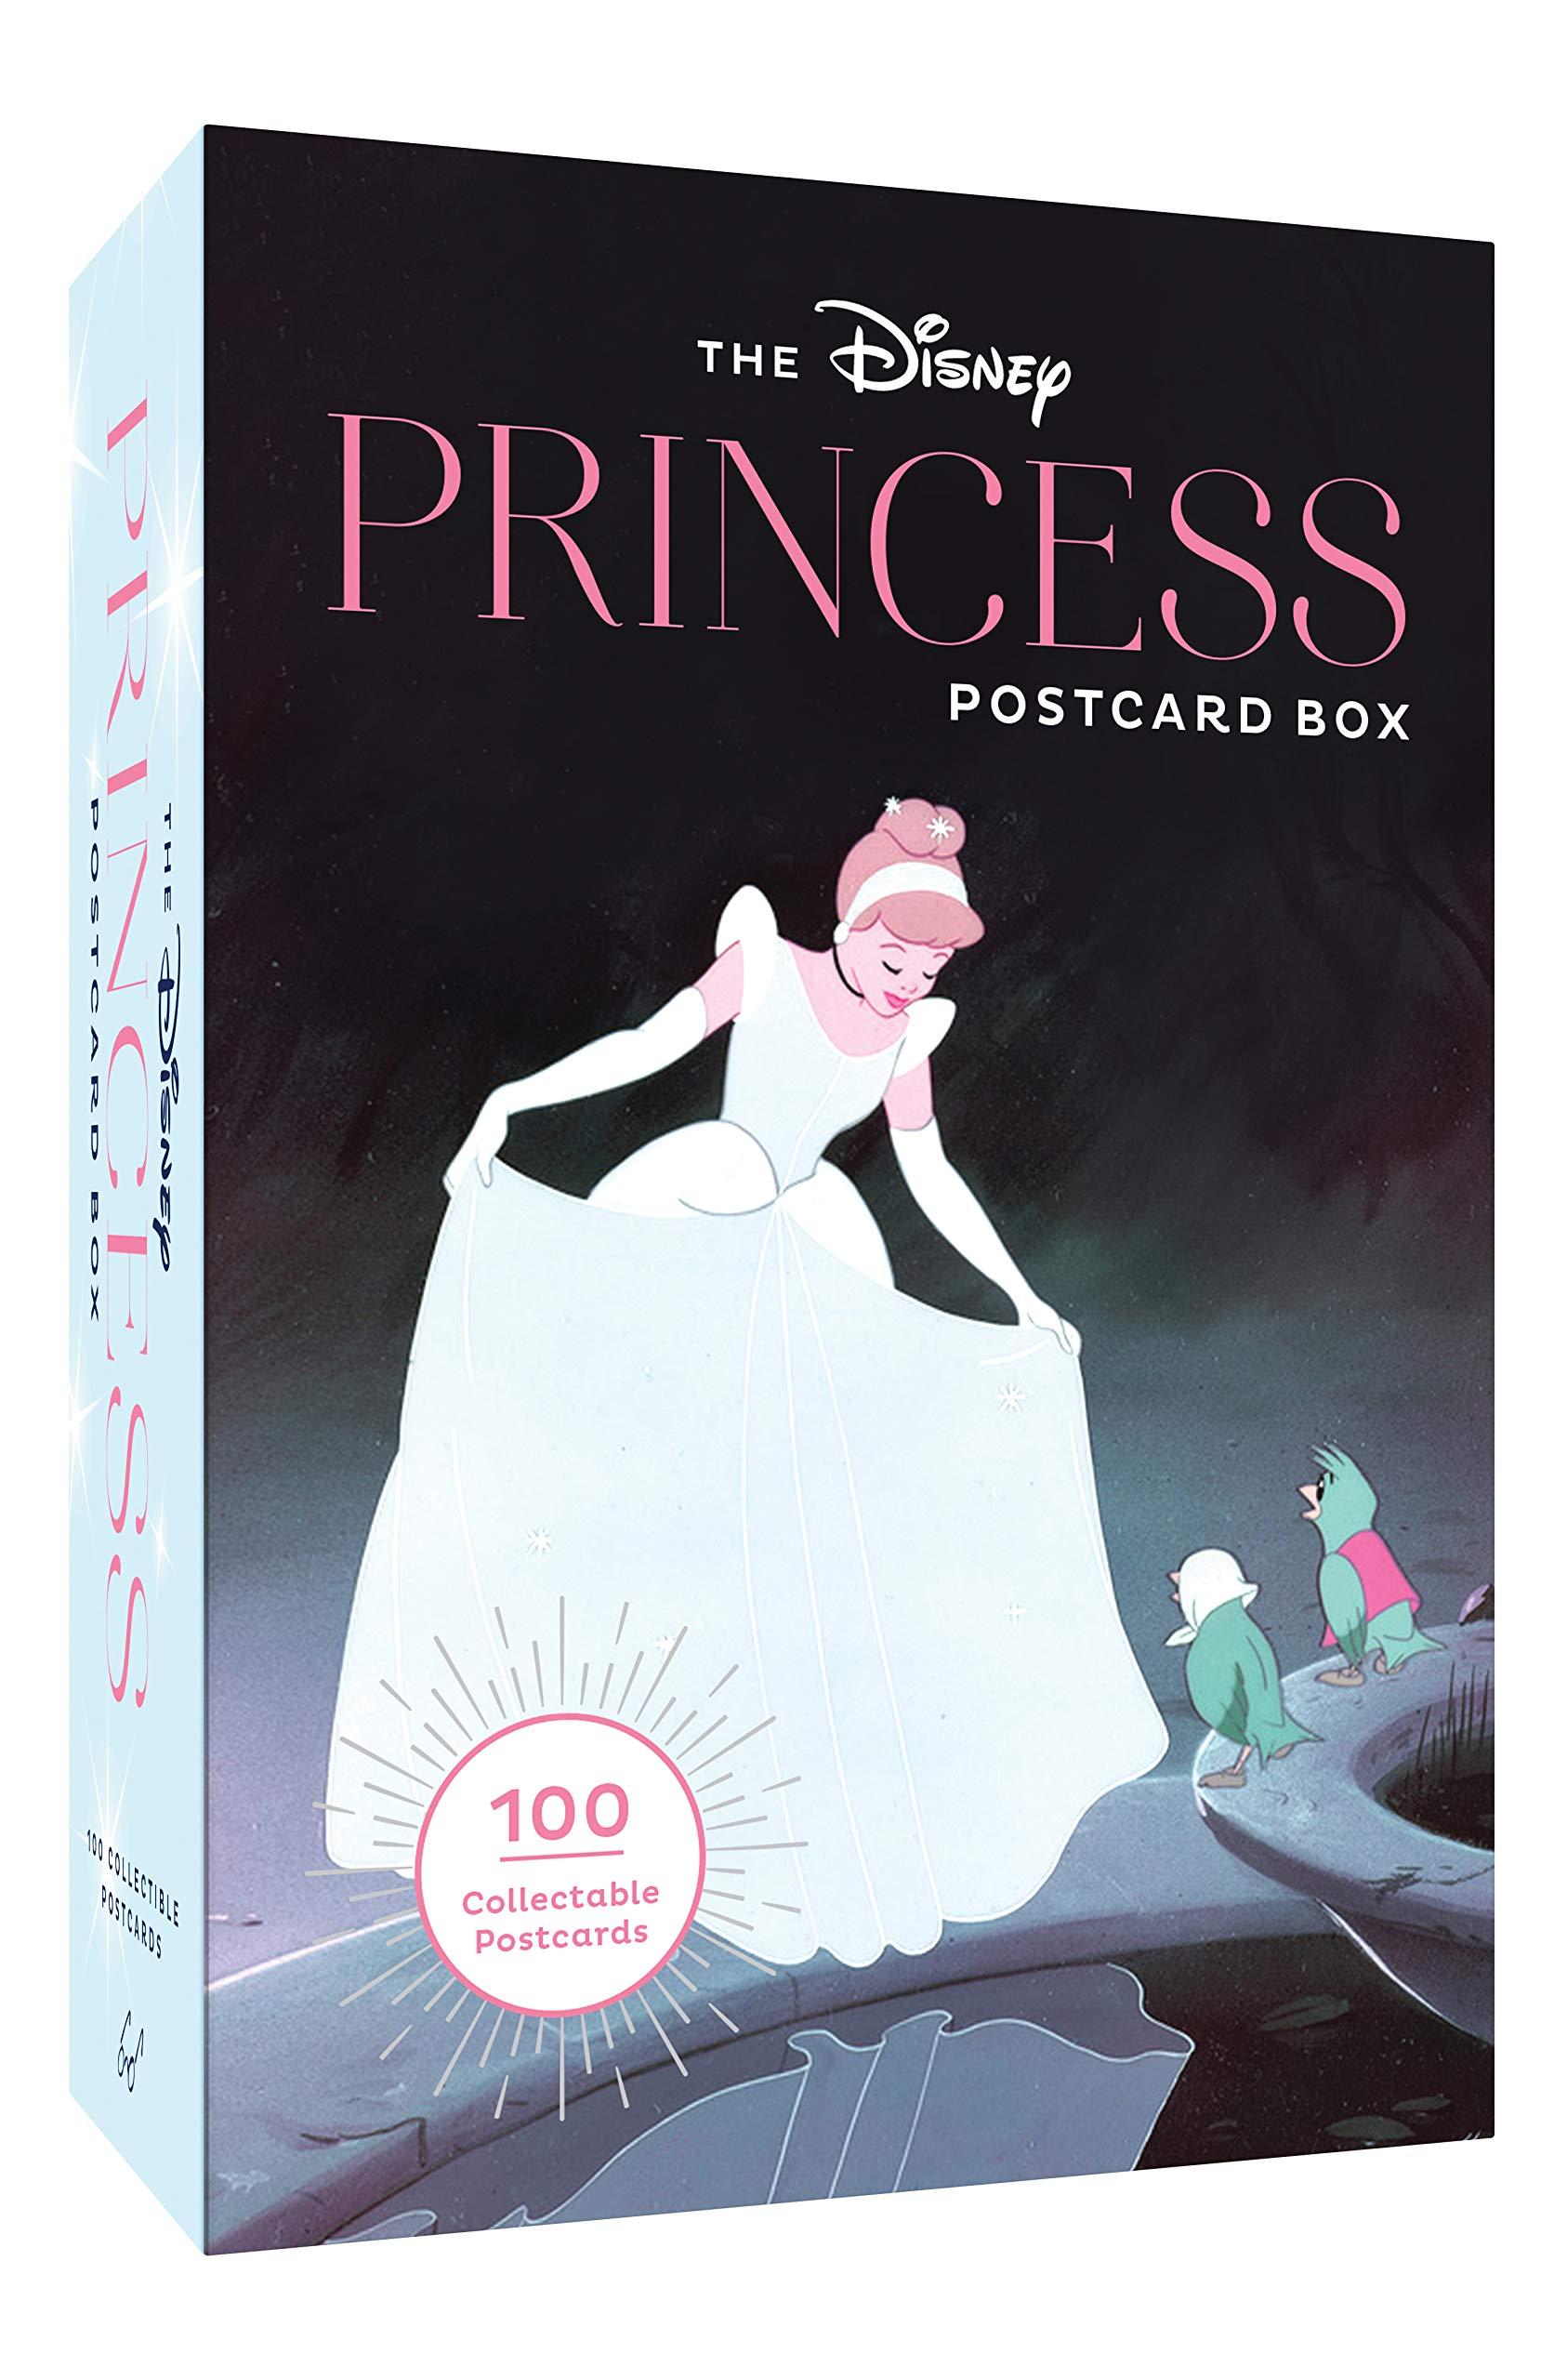 The Disney Princess Postcard Box: 100 Collectible Postcards